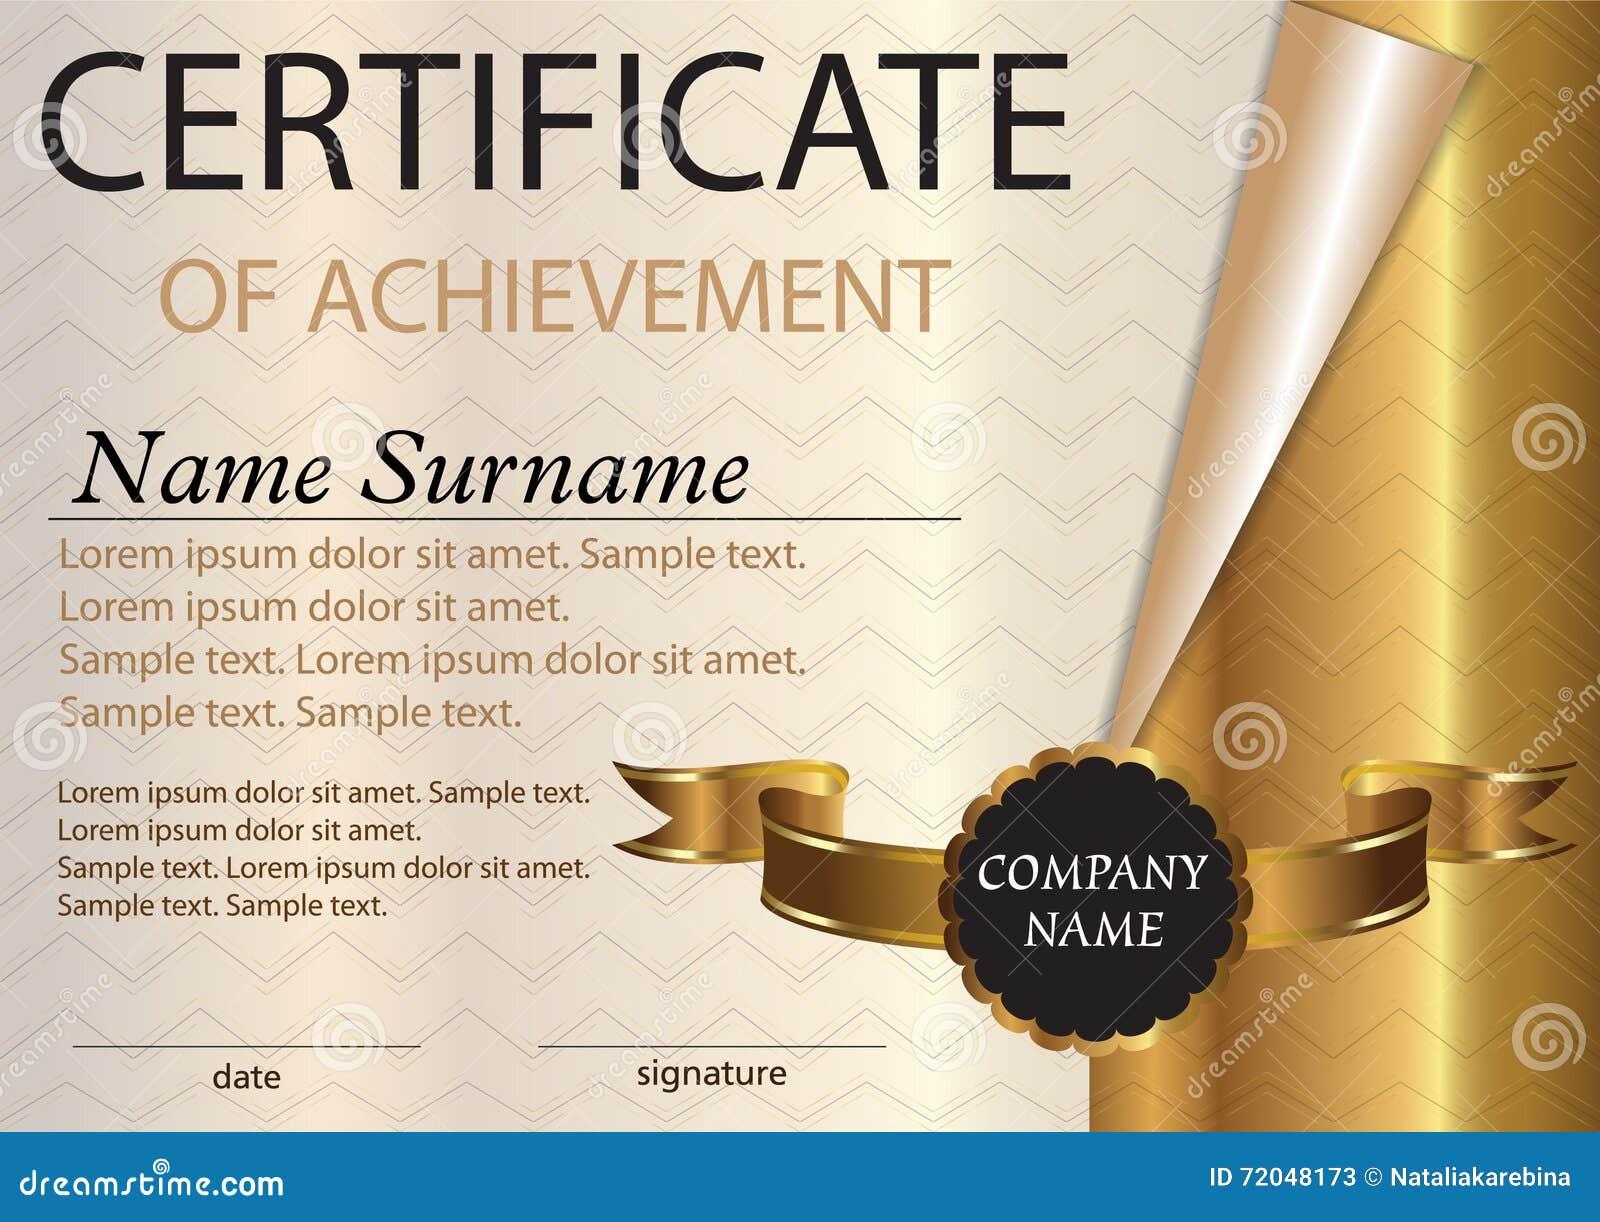 Winner Certificate Template Free